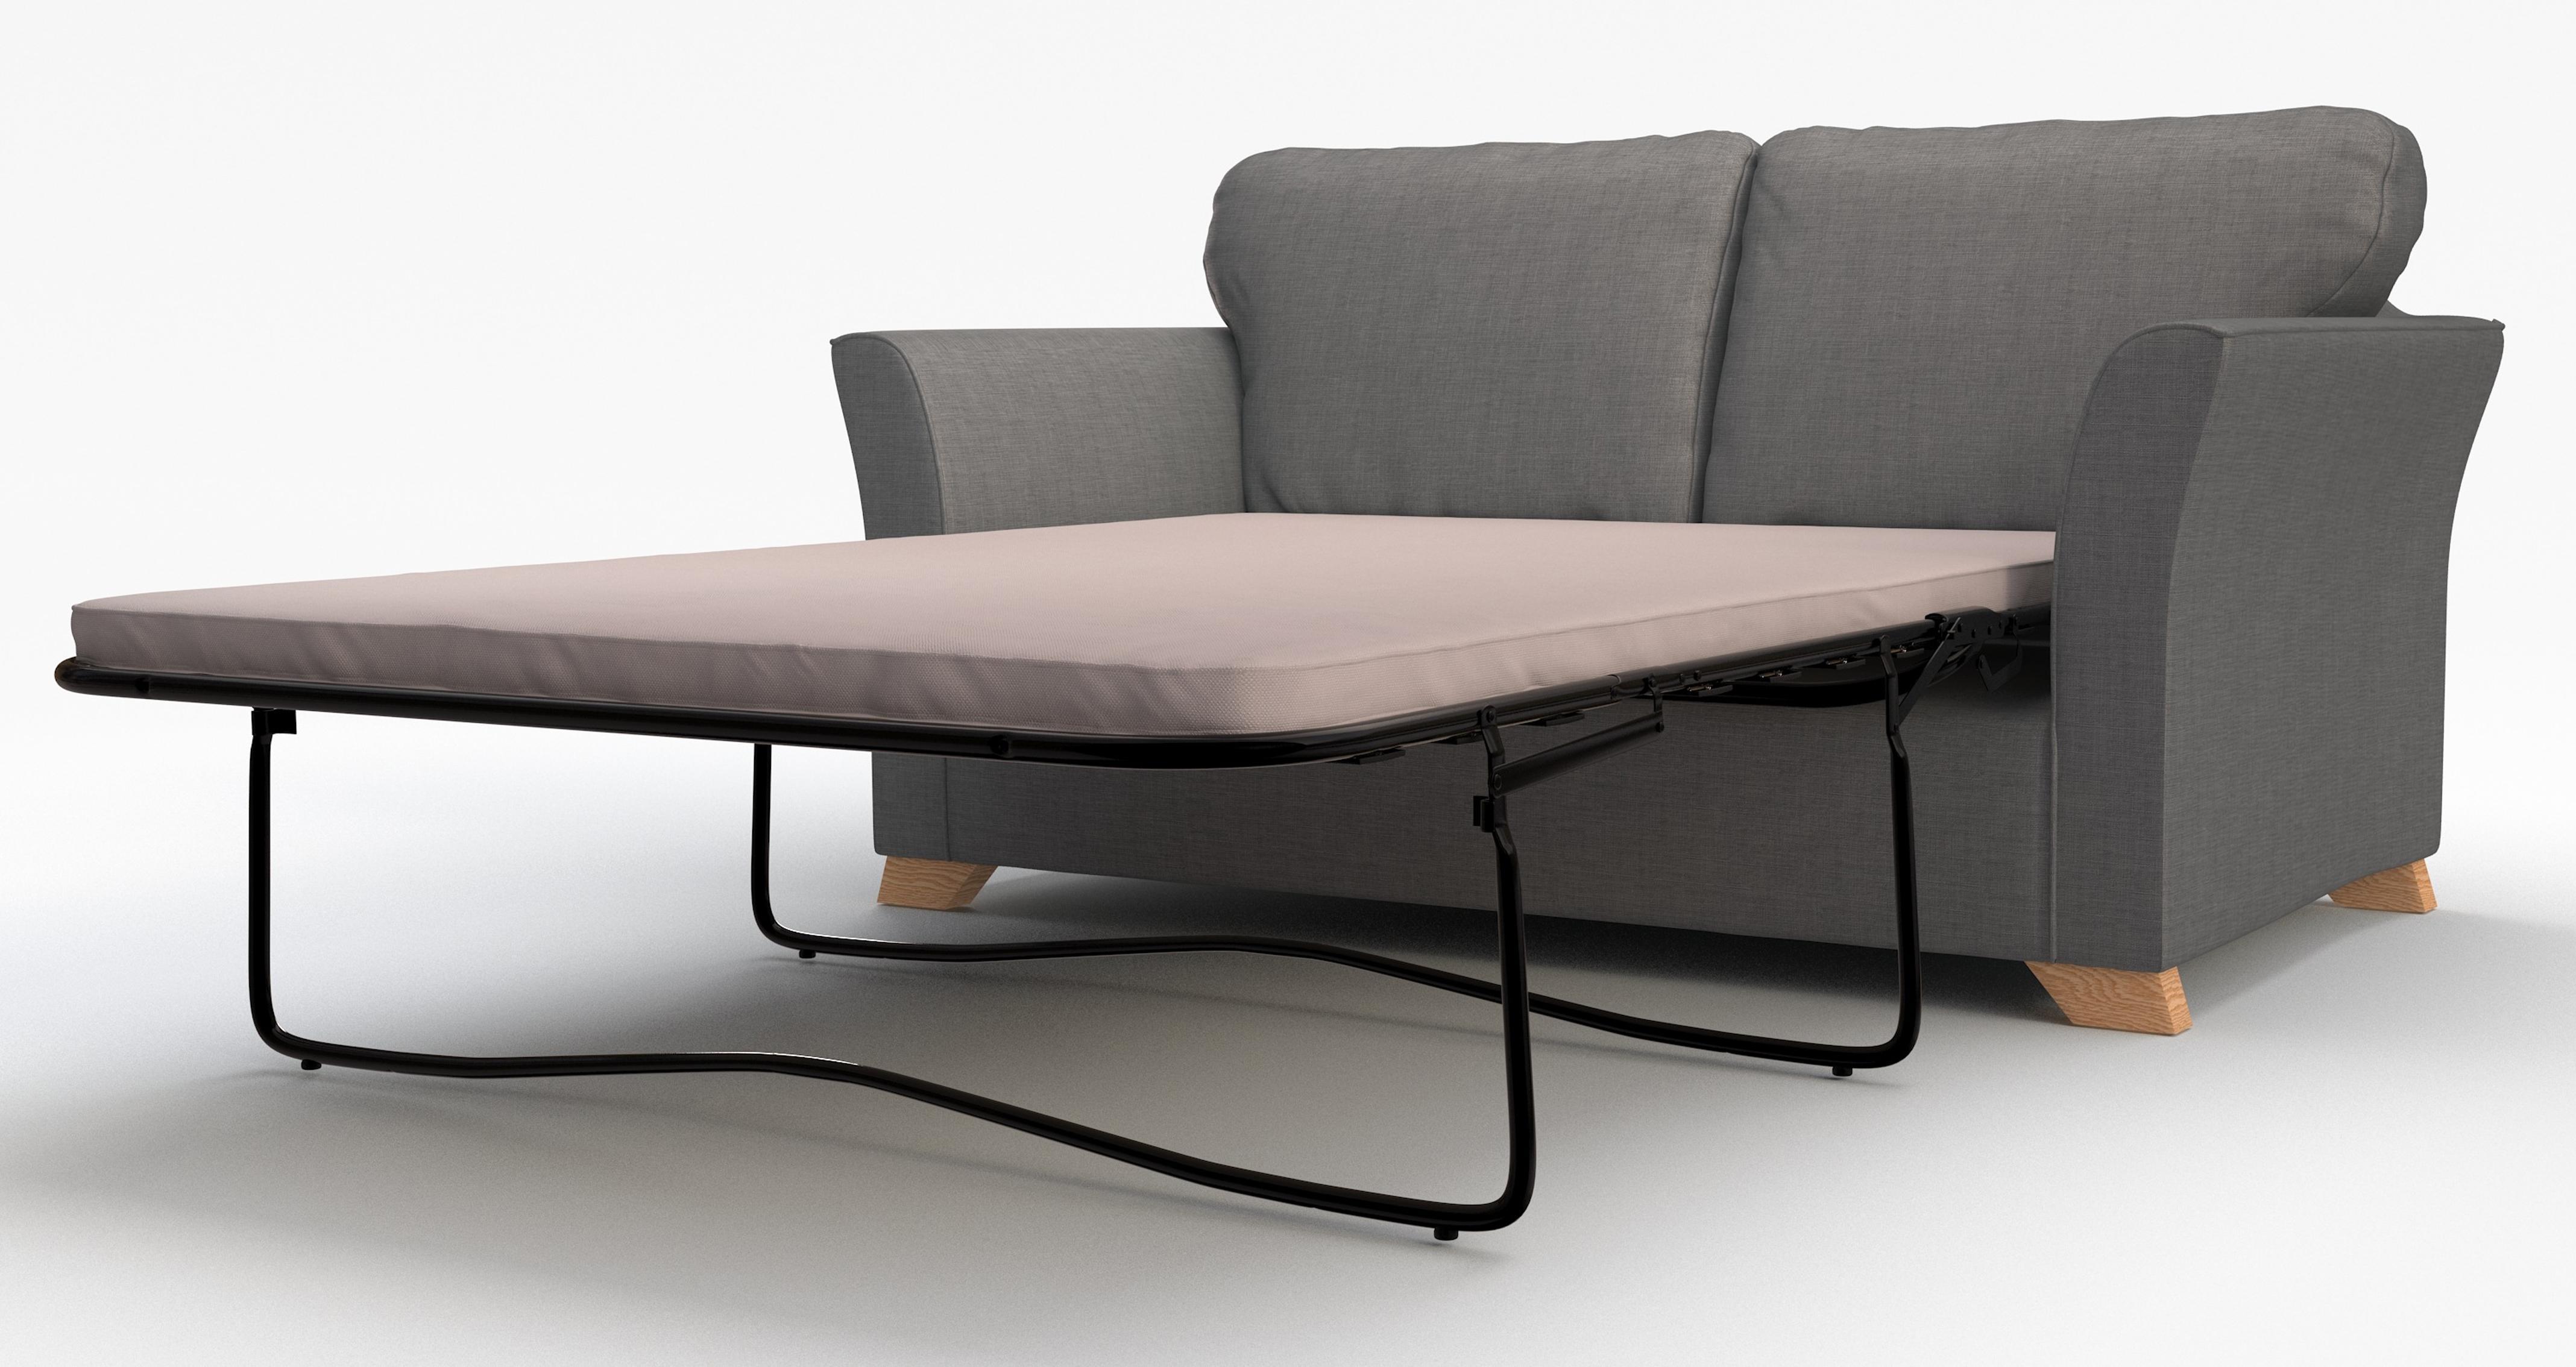 Dfs Zuma Slate Fabric Range 3 Seater 2 Str Sofa Bed